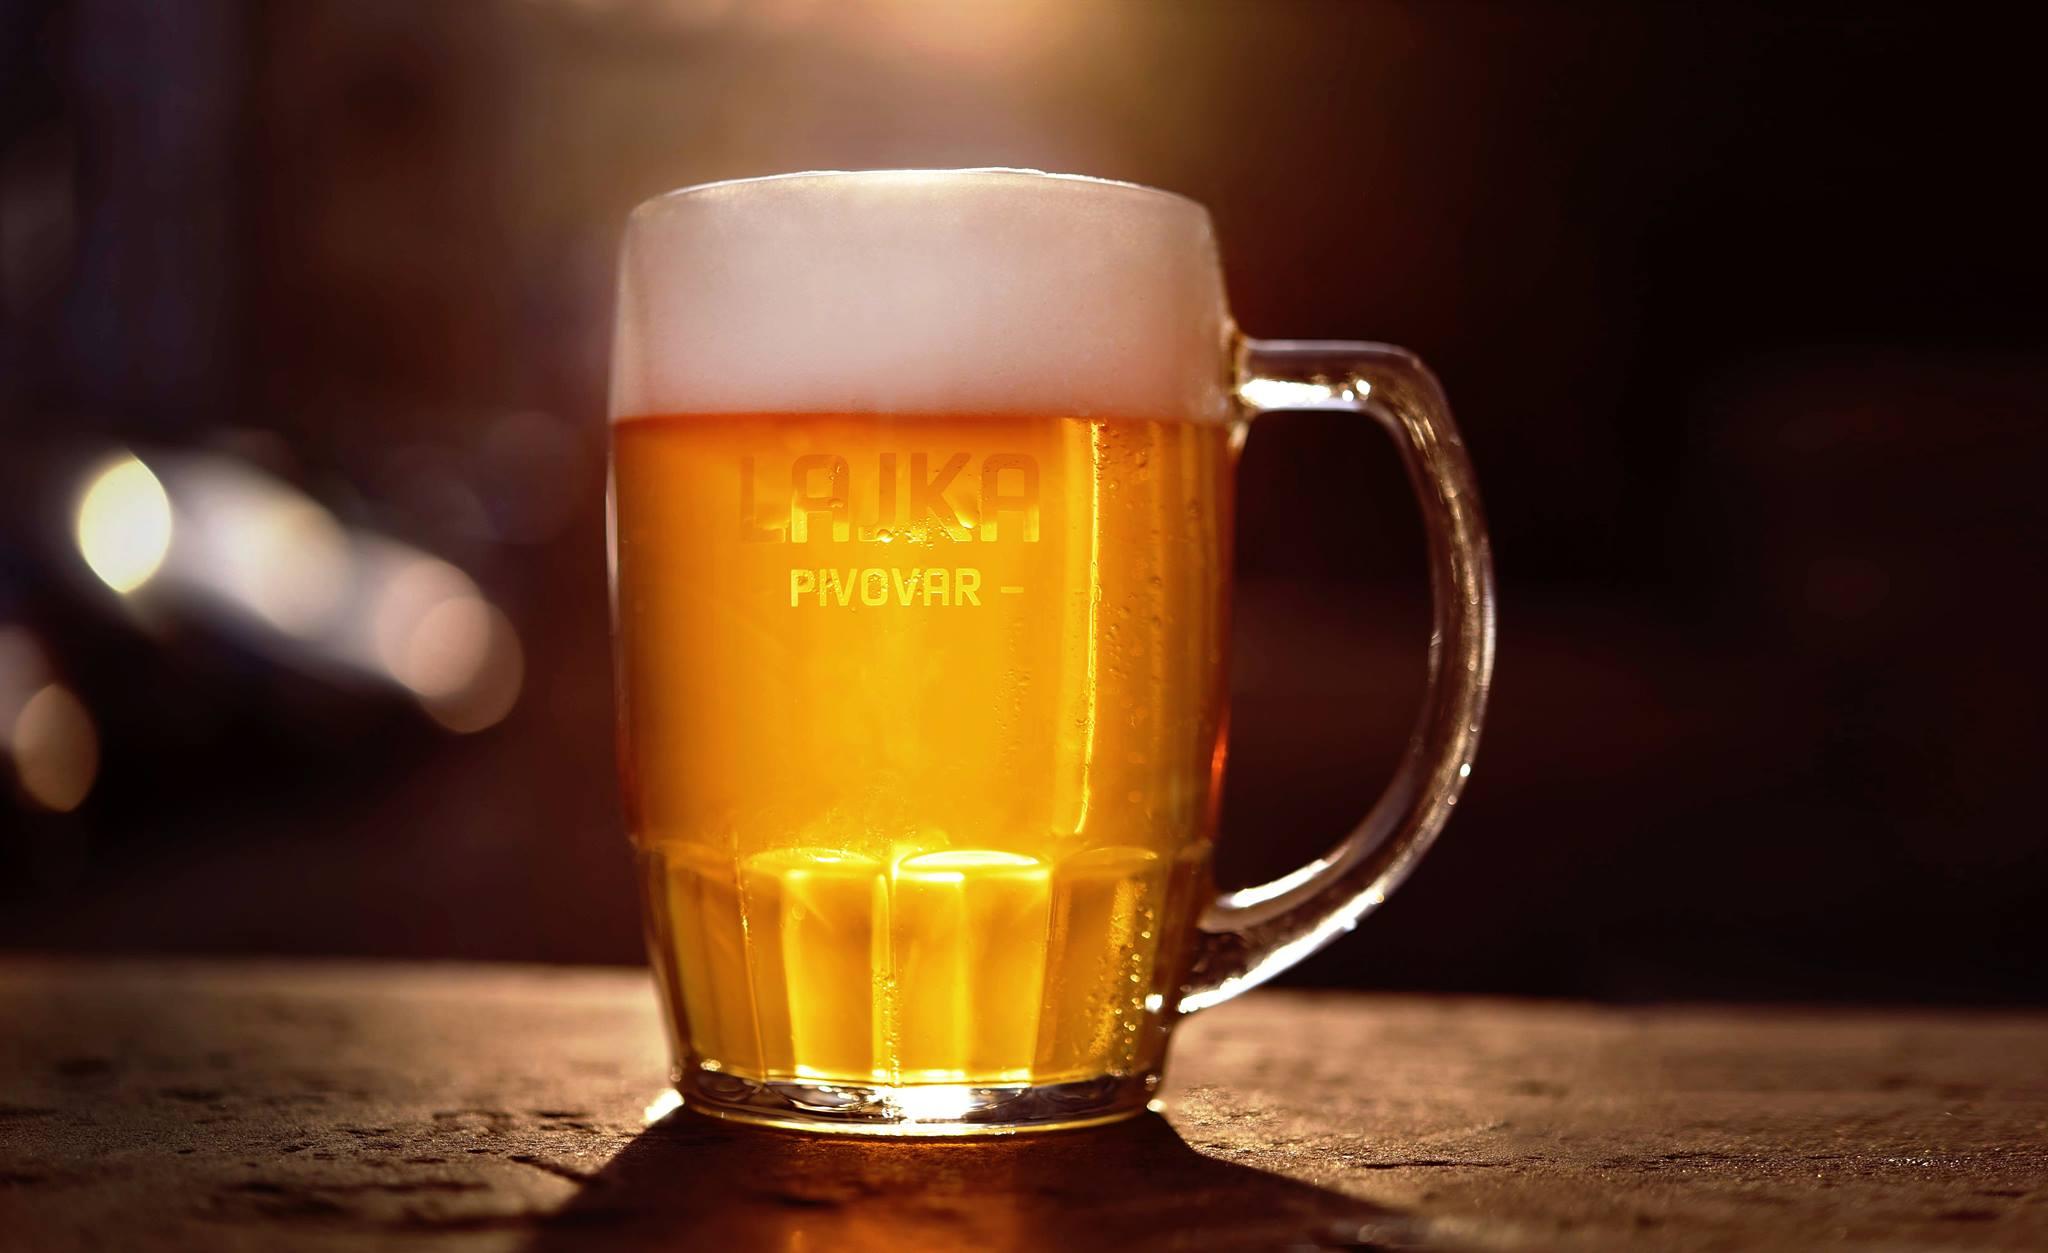 pivovari-pivovary-pivni-akce-velke-male-narazeni-otevreni-pivovaru-laika